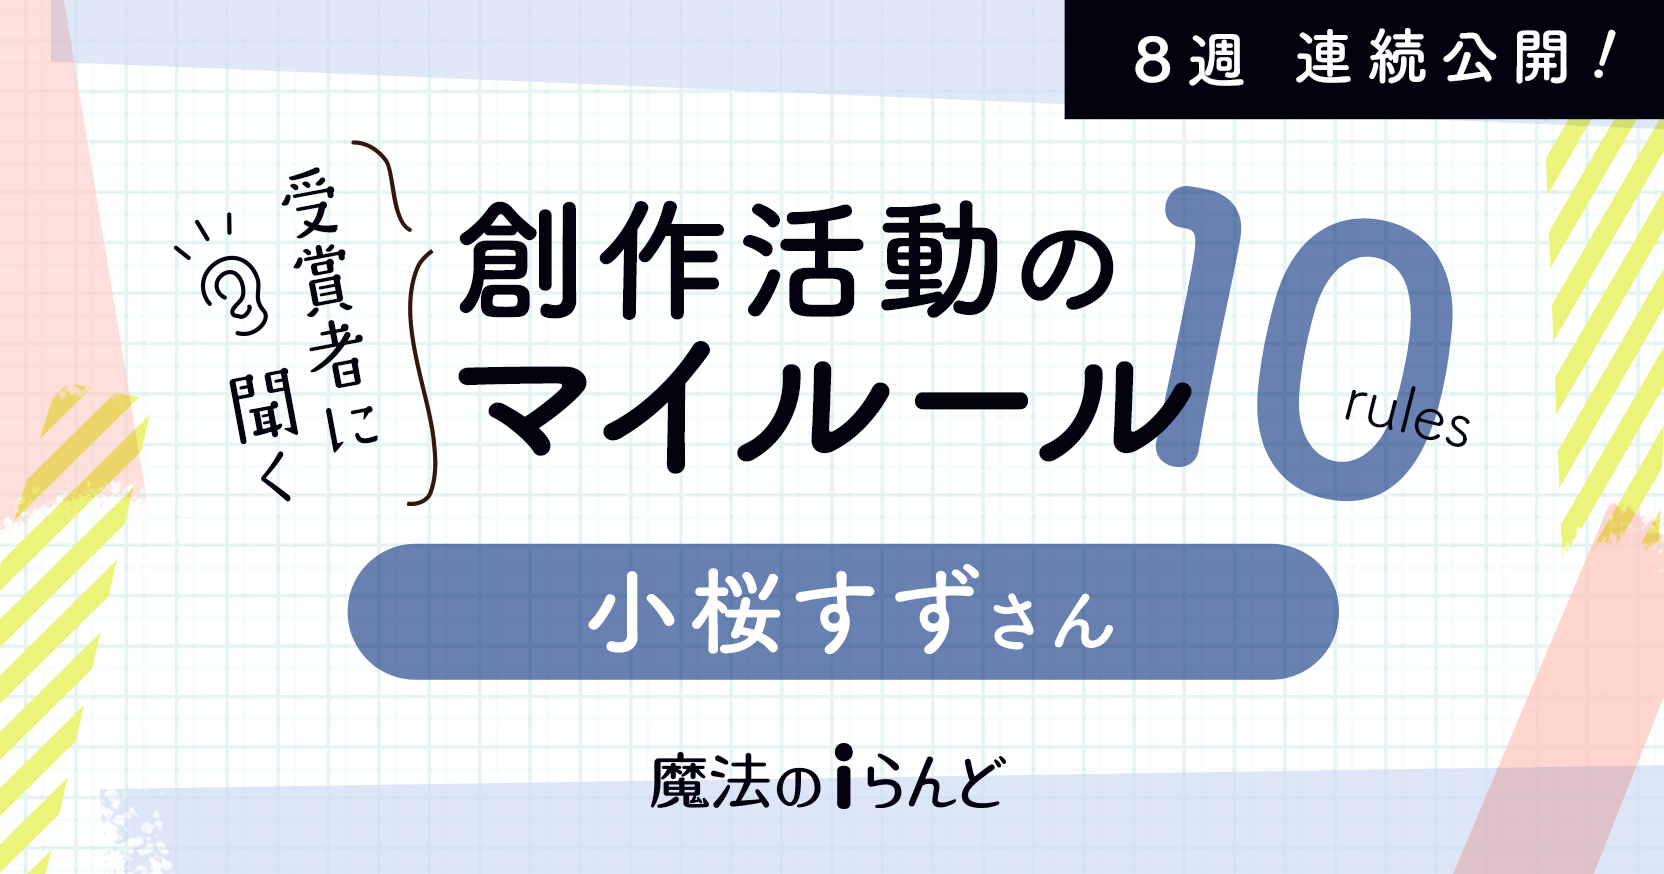 https://storage.googleapis.com/blog-info/entry/2021/08/03-myrule-kozakura_ogp.png